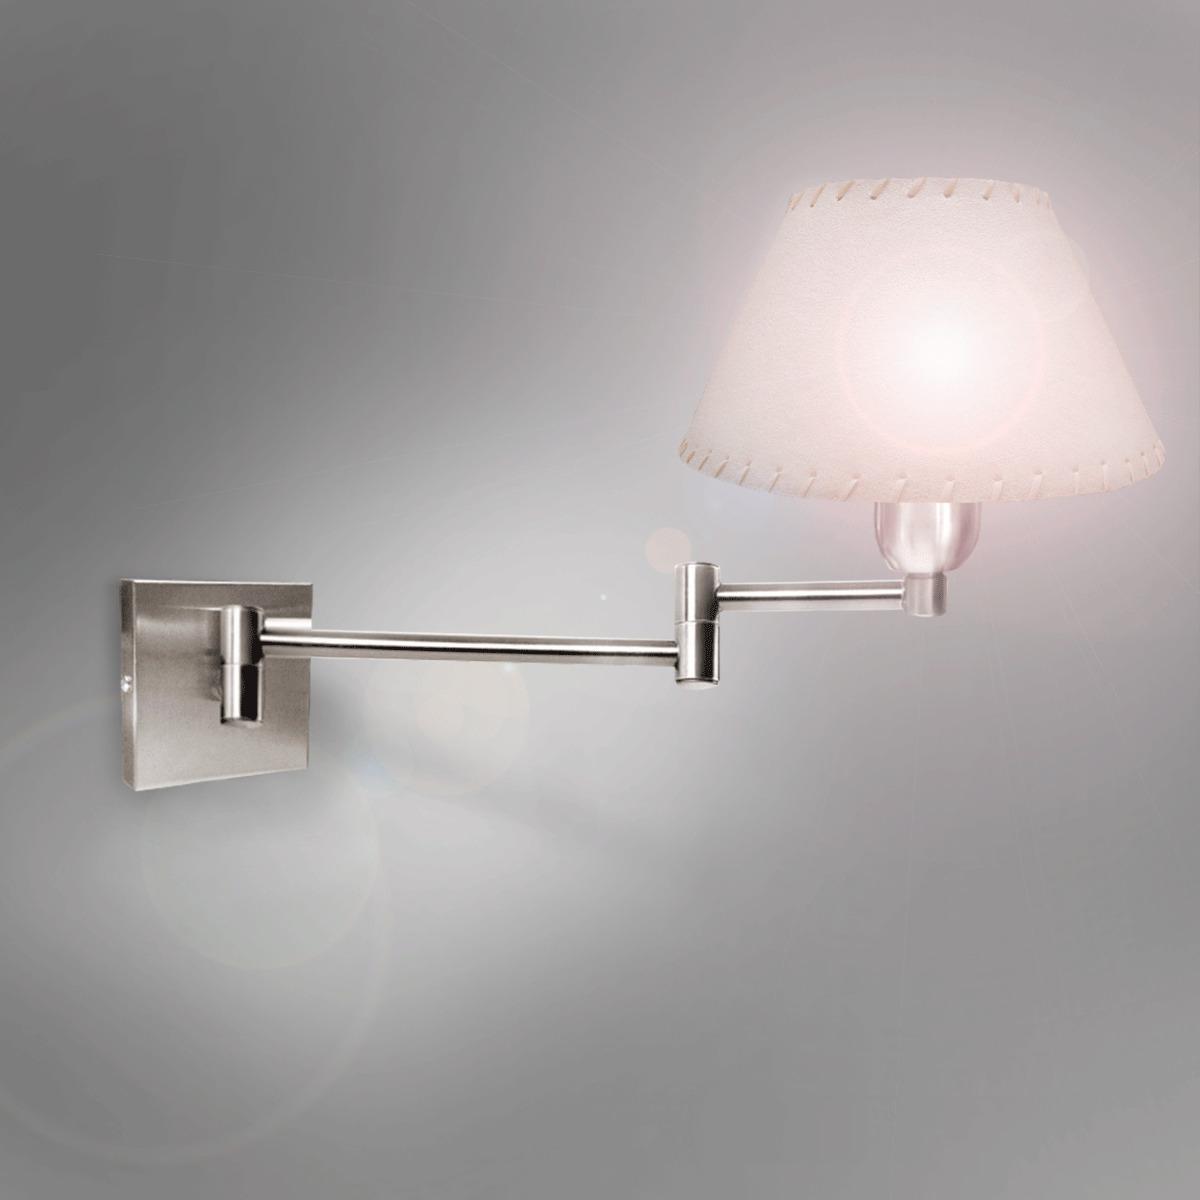 aplique lampara de pared lampara led v incluida with lamparas led de pared